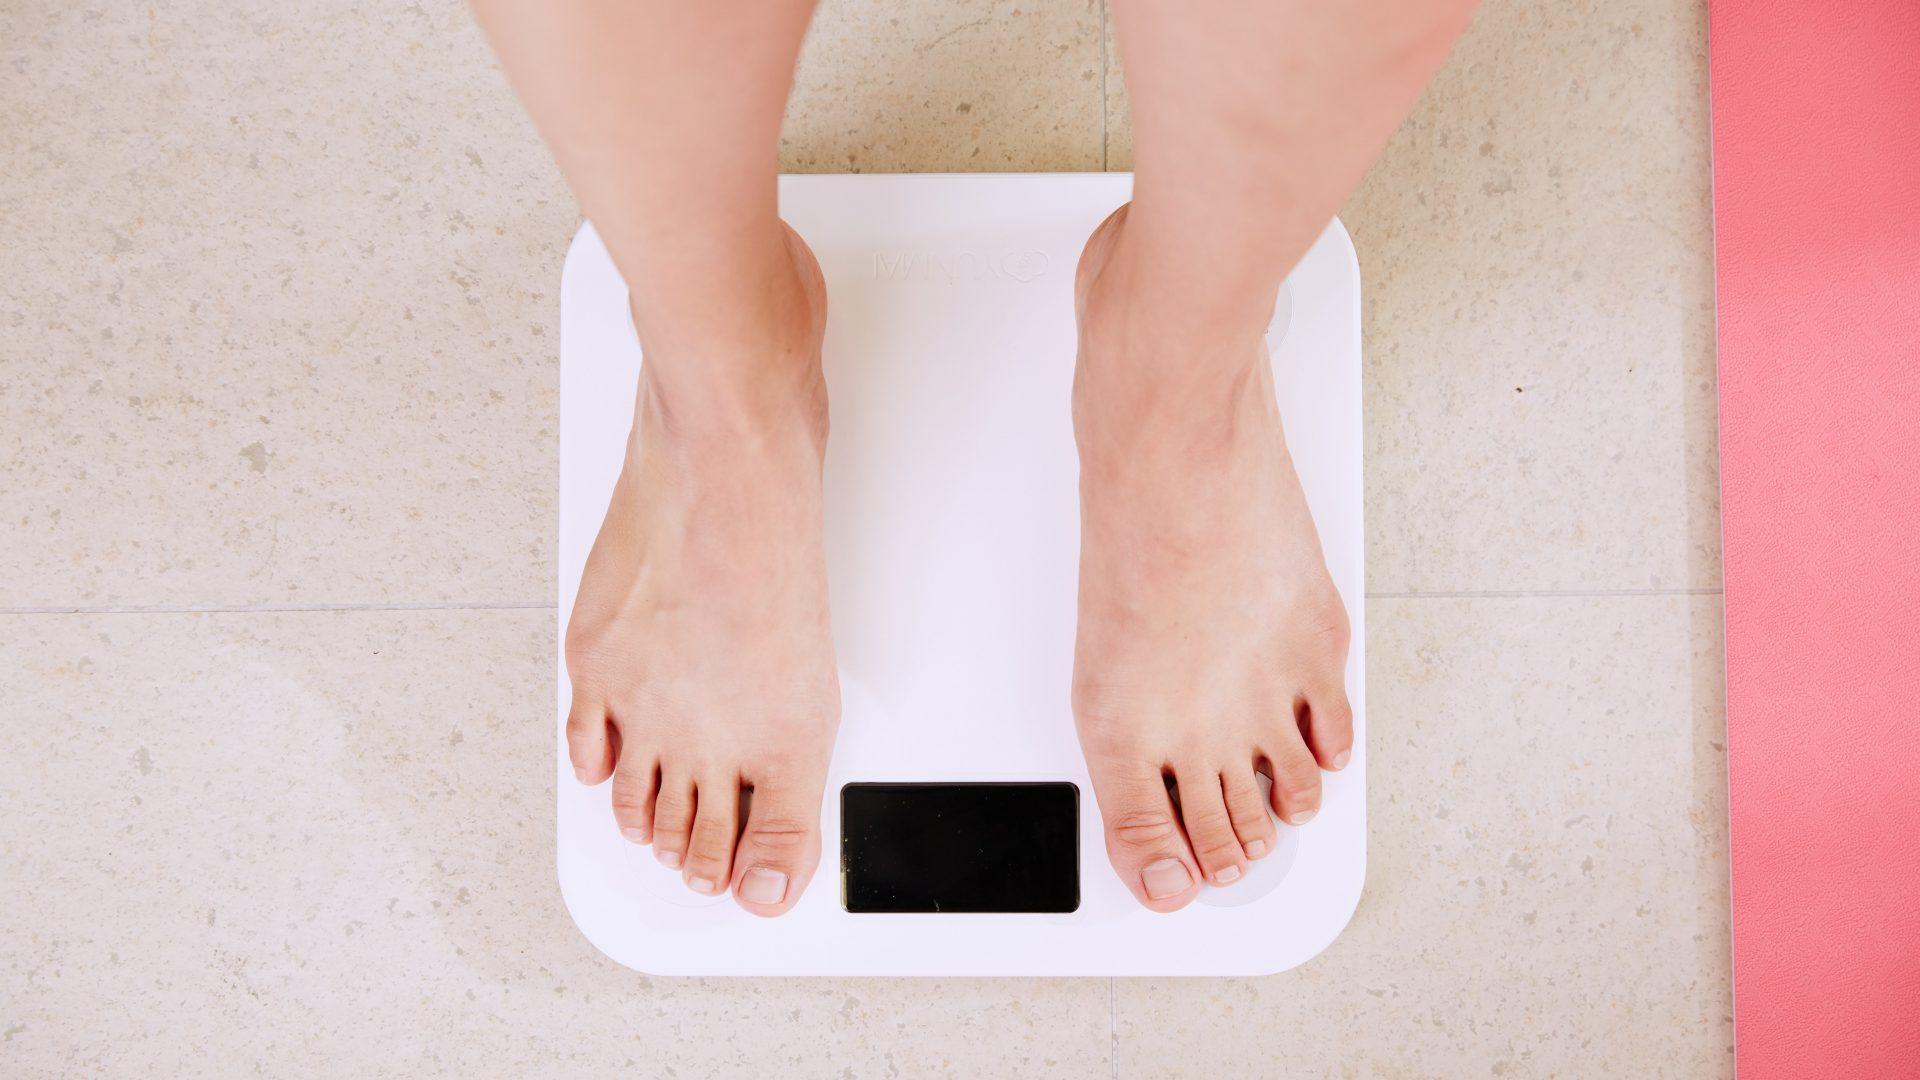 ideale gewicht te bepalen